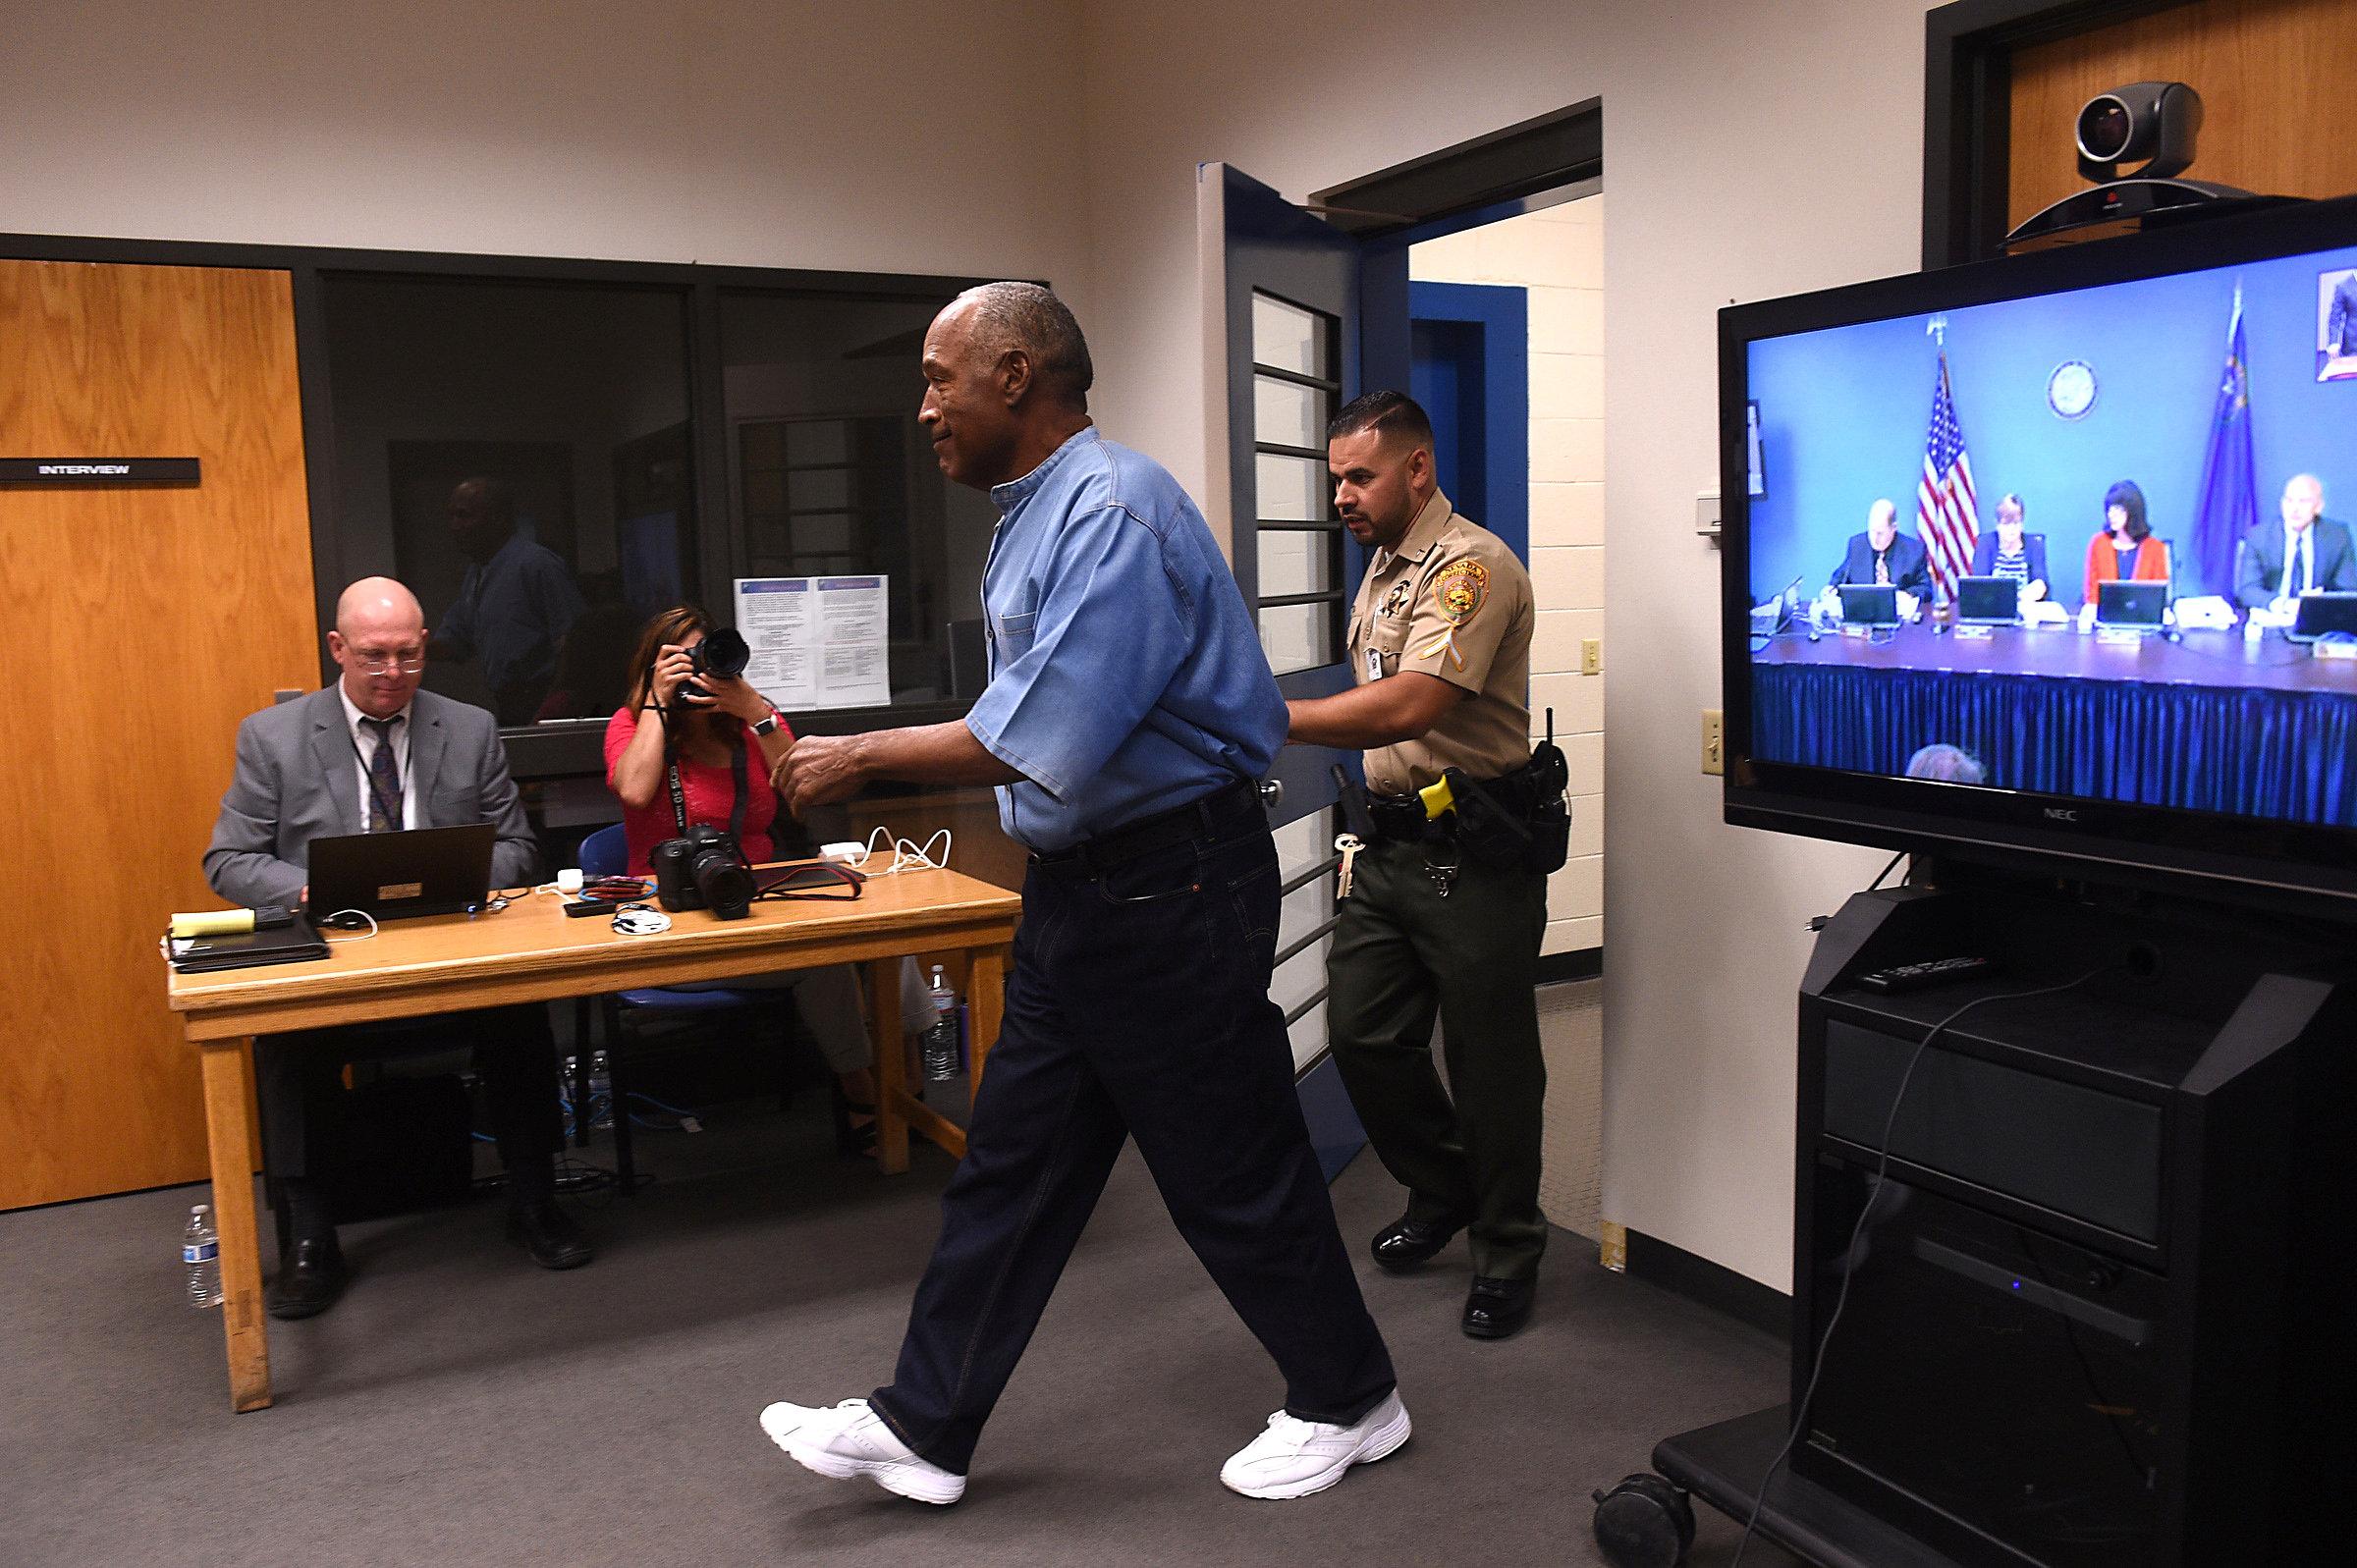 O.J. Simpson arrives for his parole hearing at Lovelock Correctional Centre in Lovelock, Nevada, U.S. July 20, 2017.  REUTERS/Jason Bean/POOL